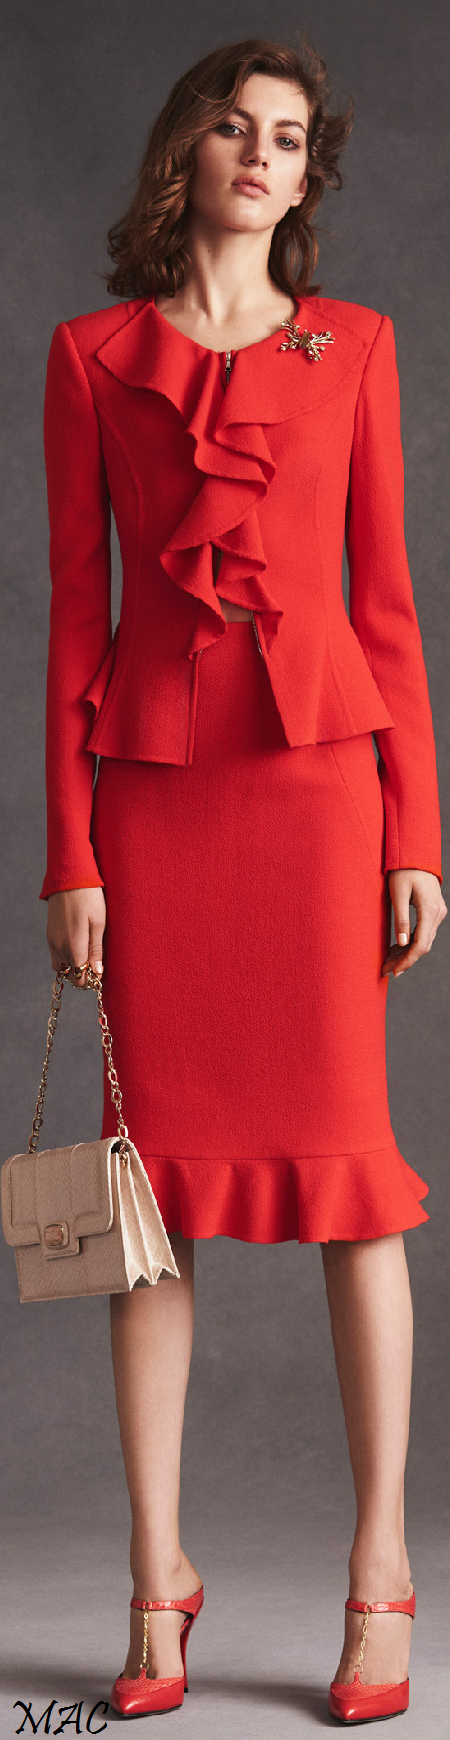 Oscar de la Renta ~ Resort Red Skirt Suit w Ruffle Trim 2016